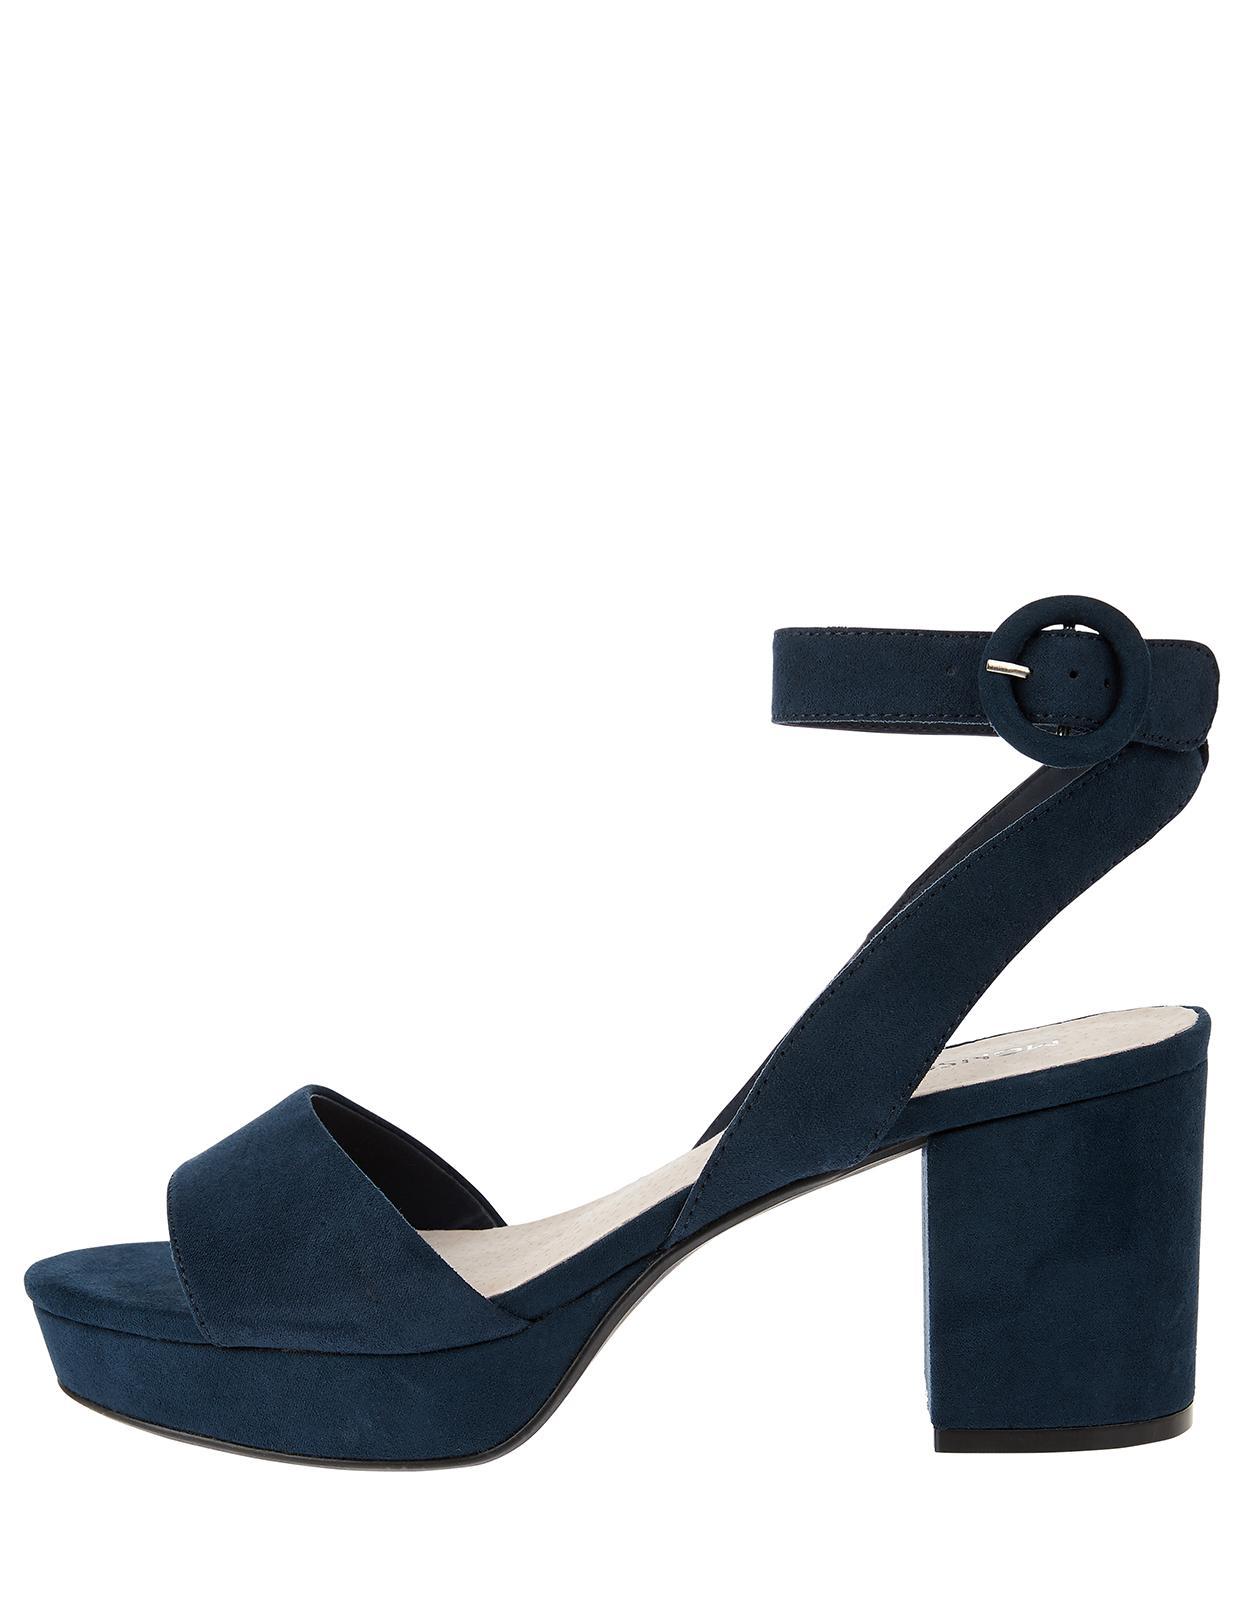 9f0902541e0 Monsoon Paige Platform Block Heel Sandals in Blue - Lyst